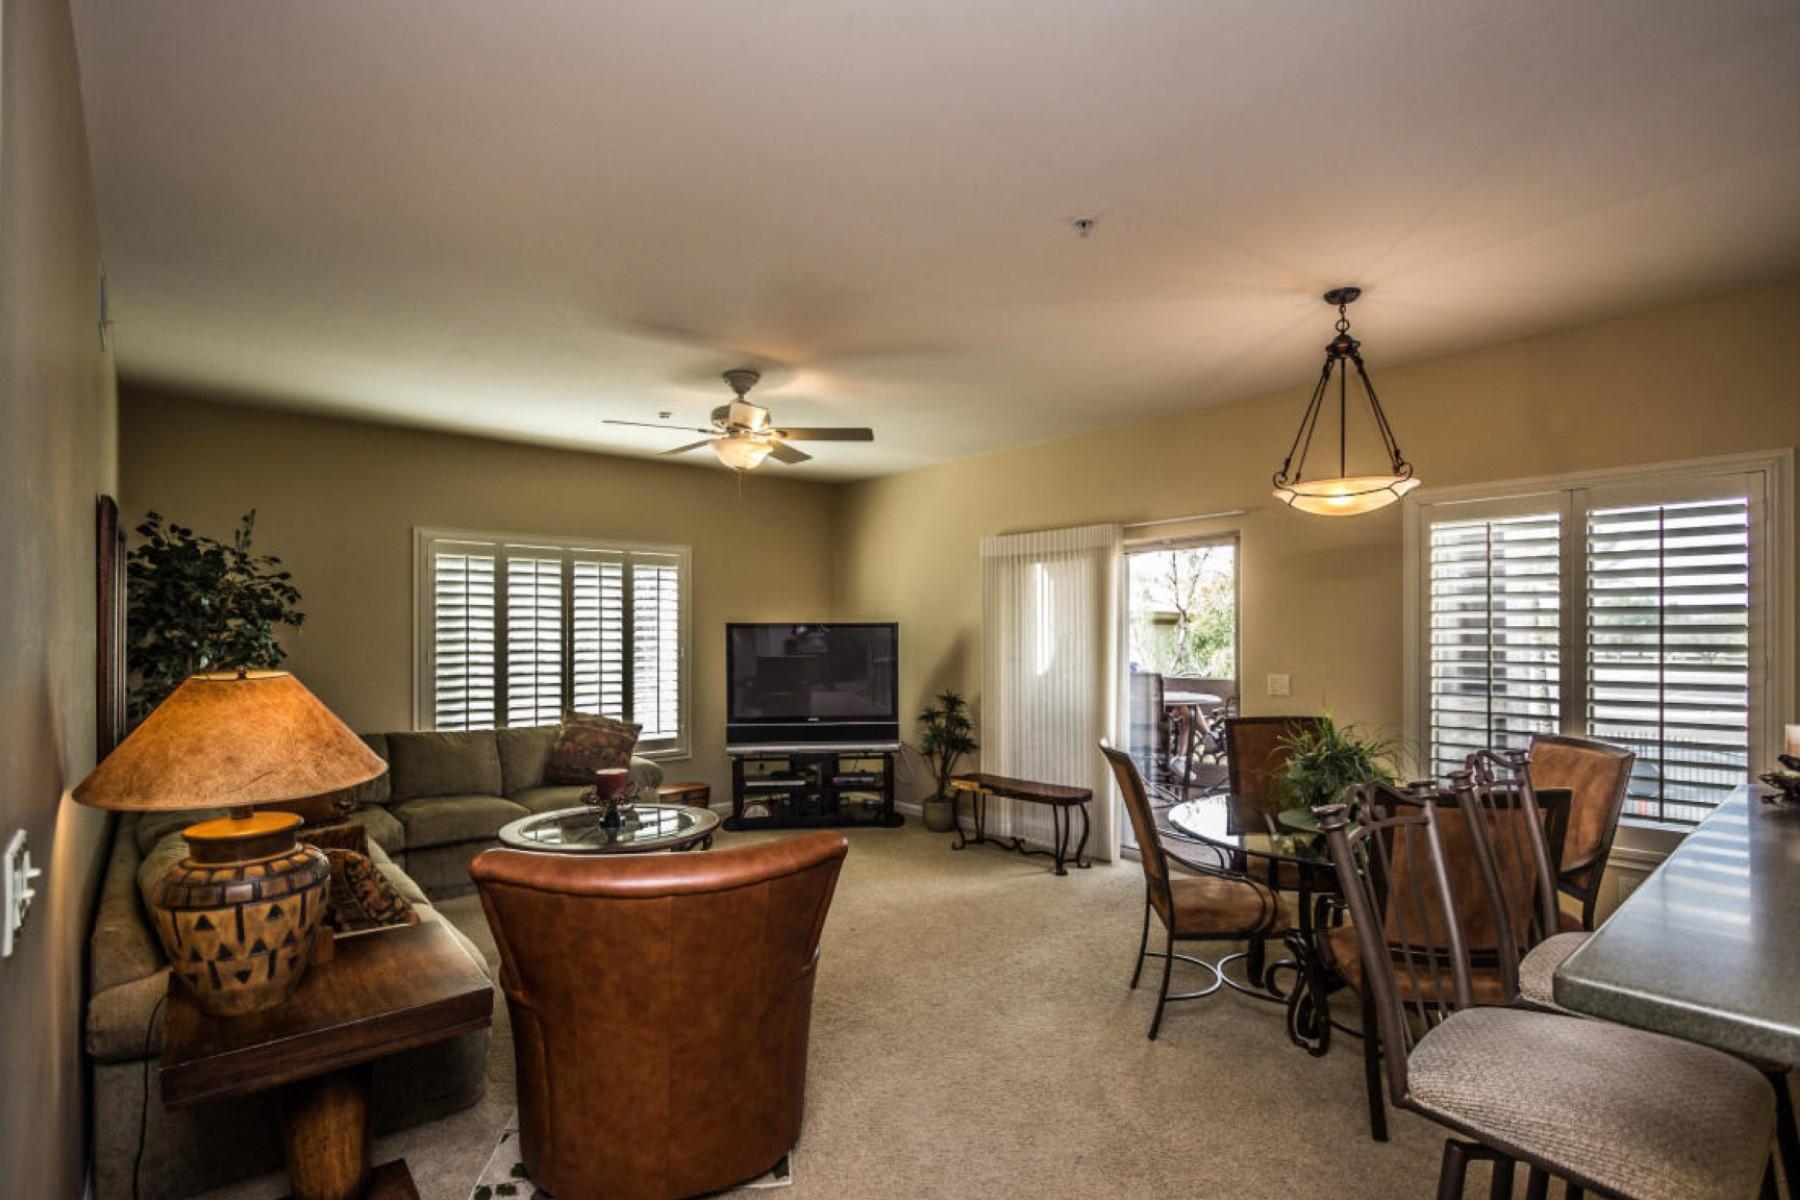 Nhà chung cư vì Bán tại Beautiful Condo Located In Resort Style Community Of Bella Vista 14000 N 94th Street #2129 Scottsdale, Arizona 85260 Hoa Kỳ